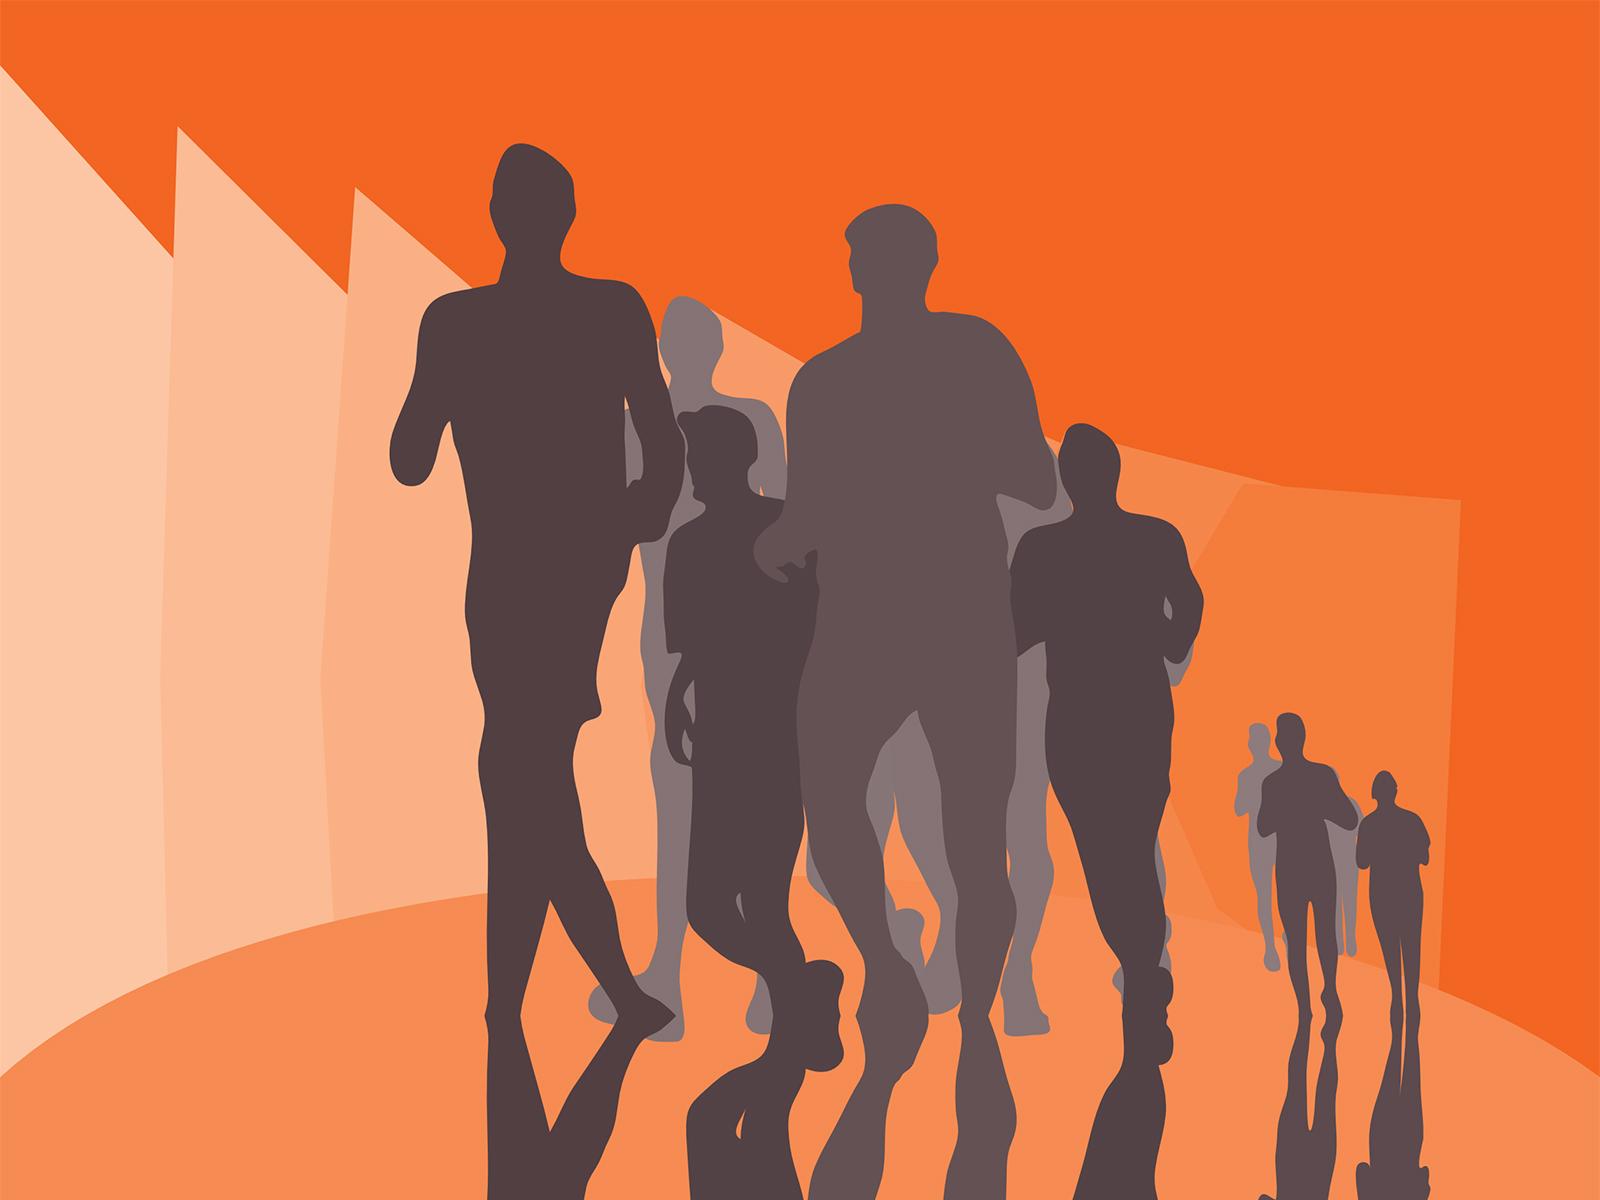 running marathon backgrounds orange sports templates